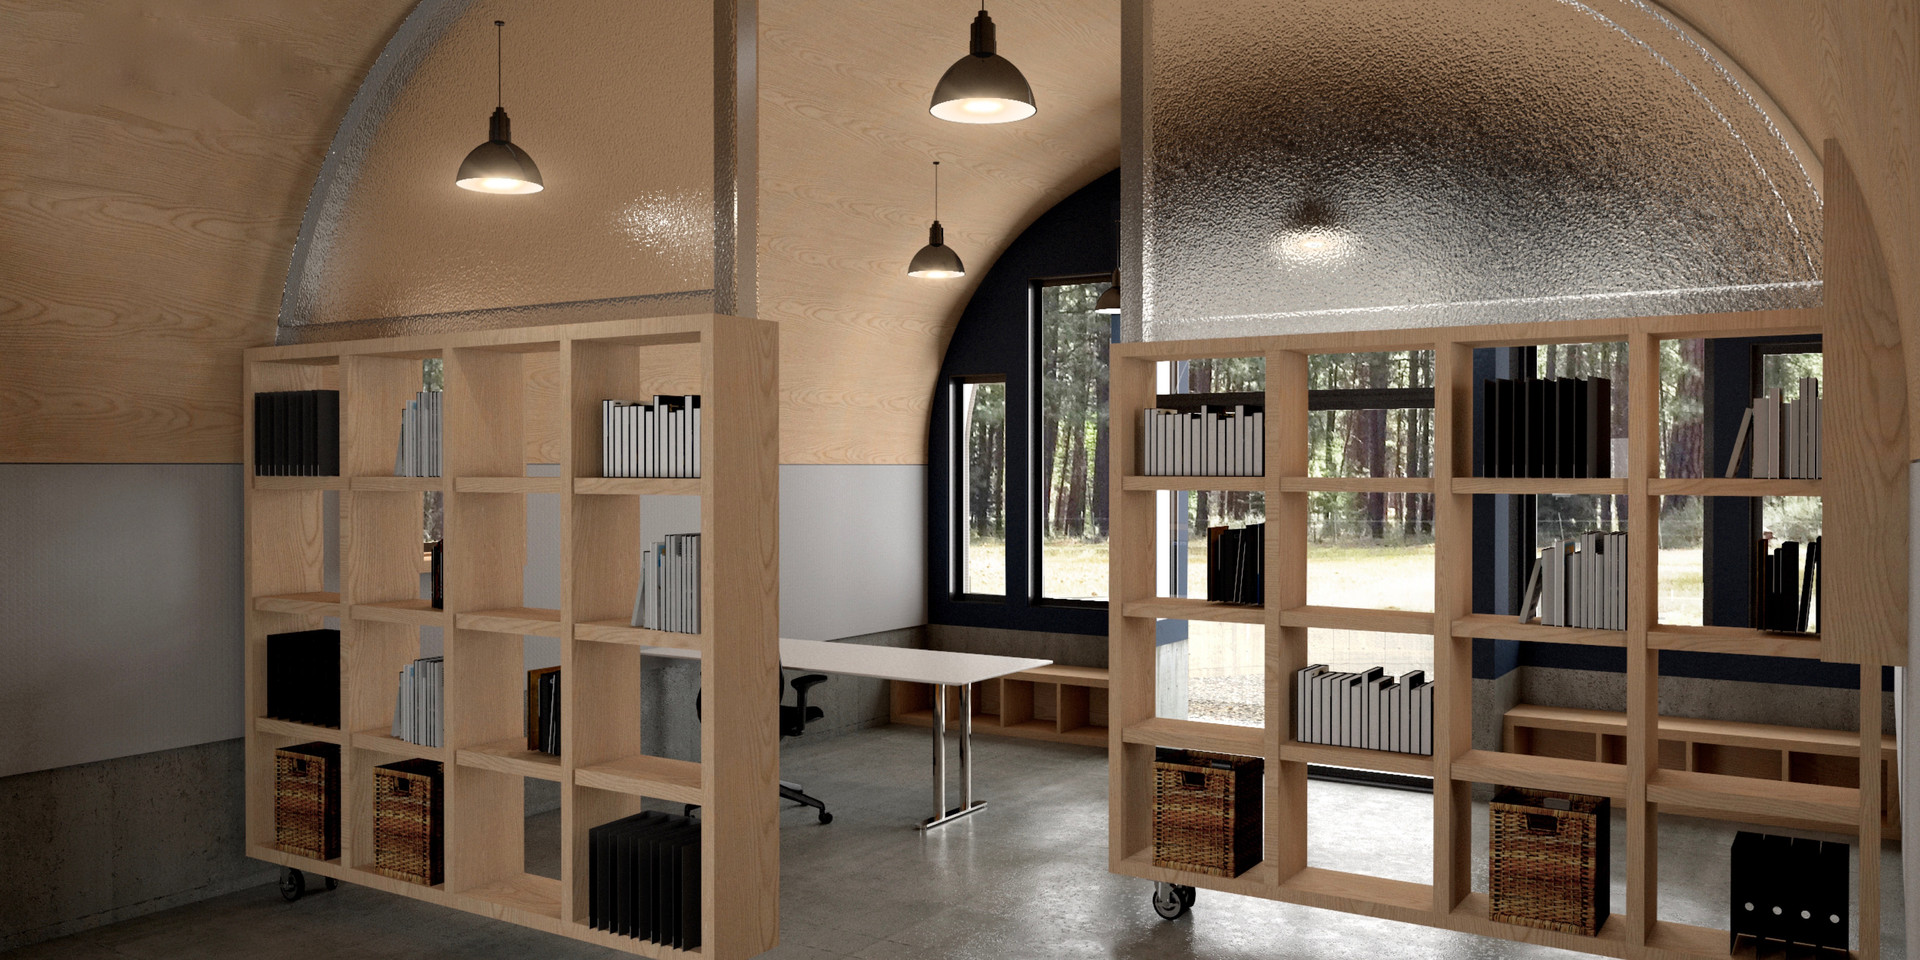 Interior View 2 - 3D Visualization - 09-